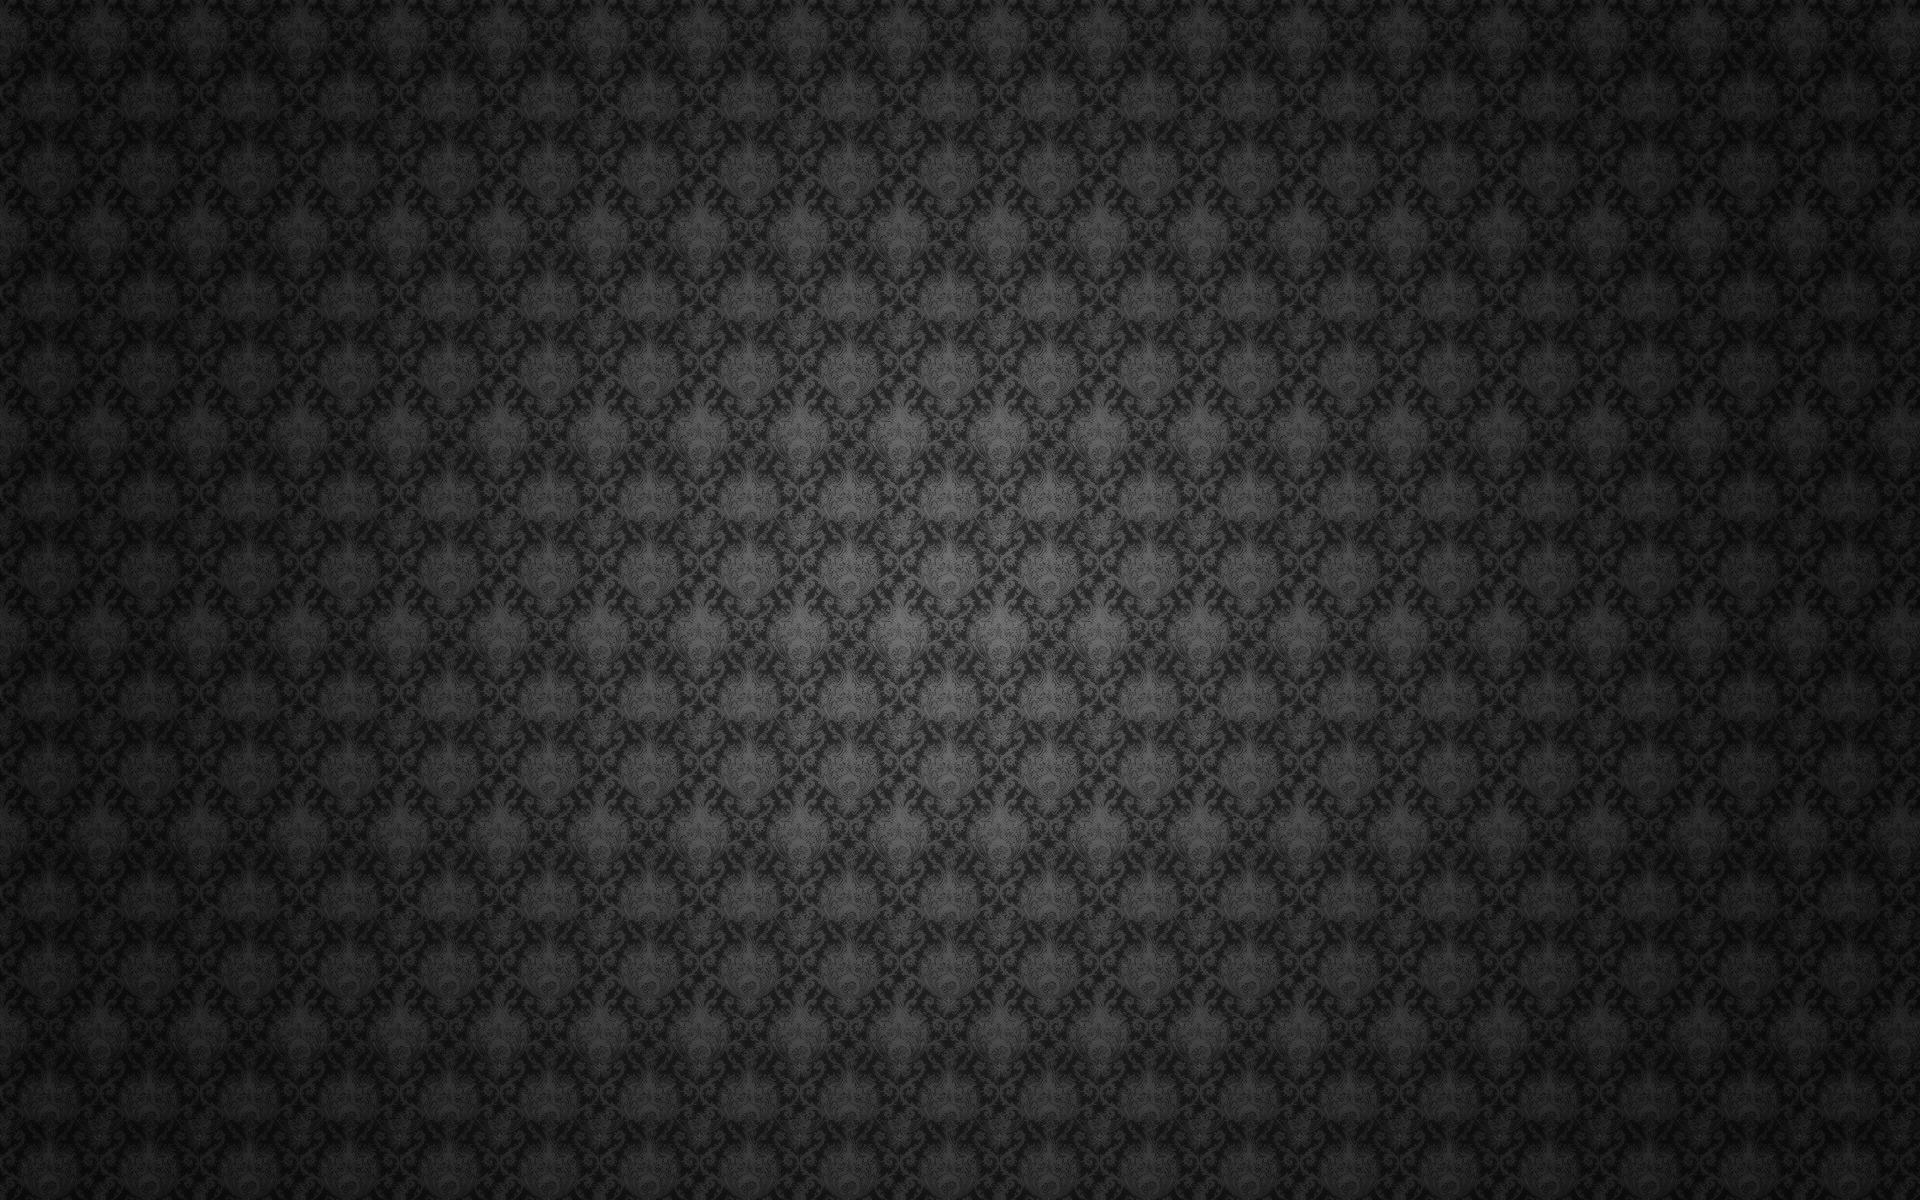 arri re plan bureau 10 000 fonds d 39 cran hd gratuits et de qualit wallpapers hd. Black Bedroom Furniture Sets. Home Design Ideas